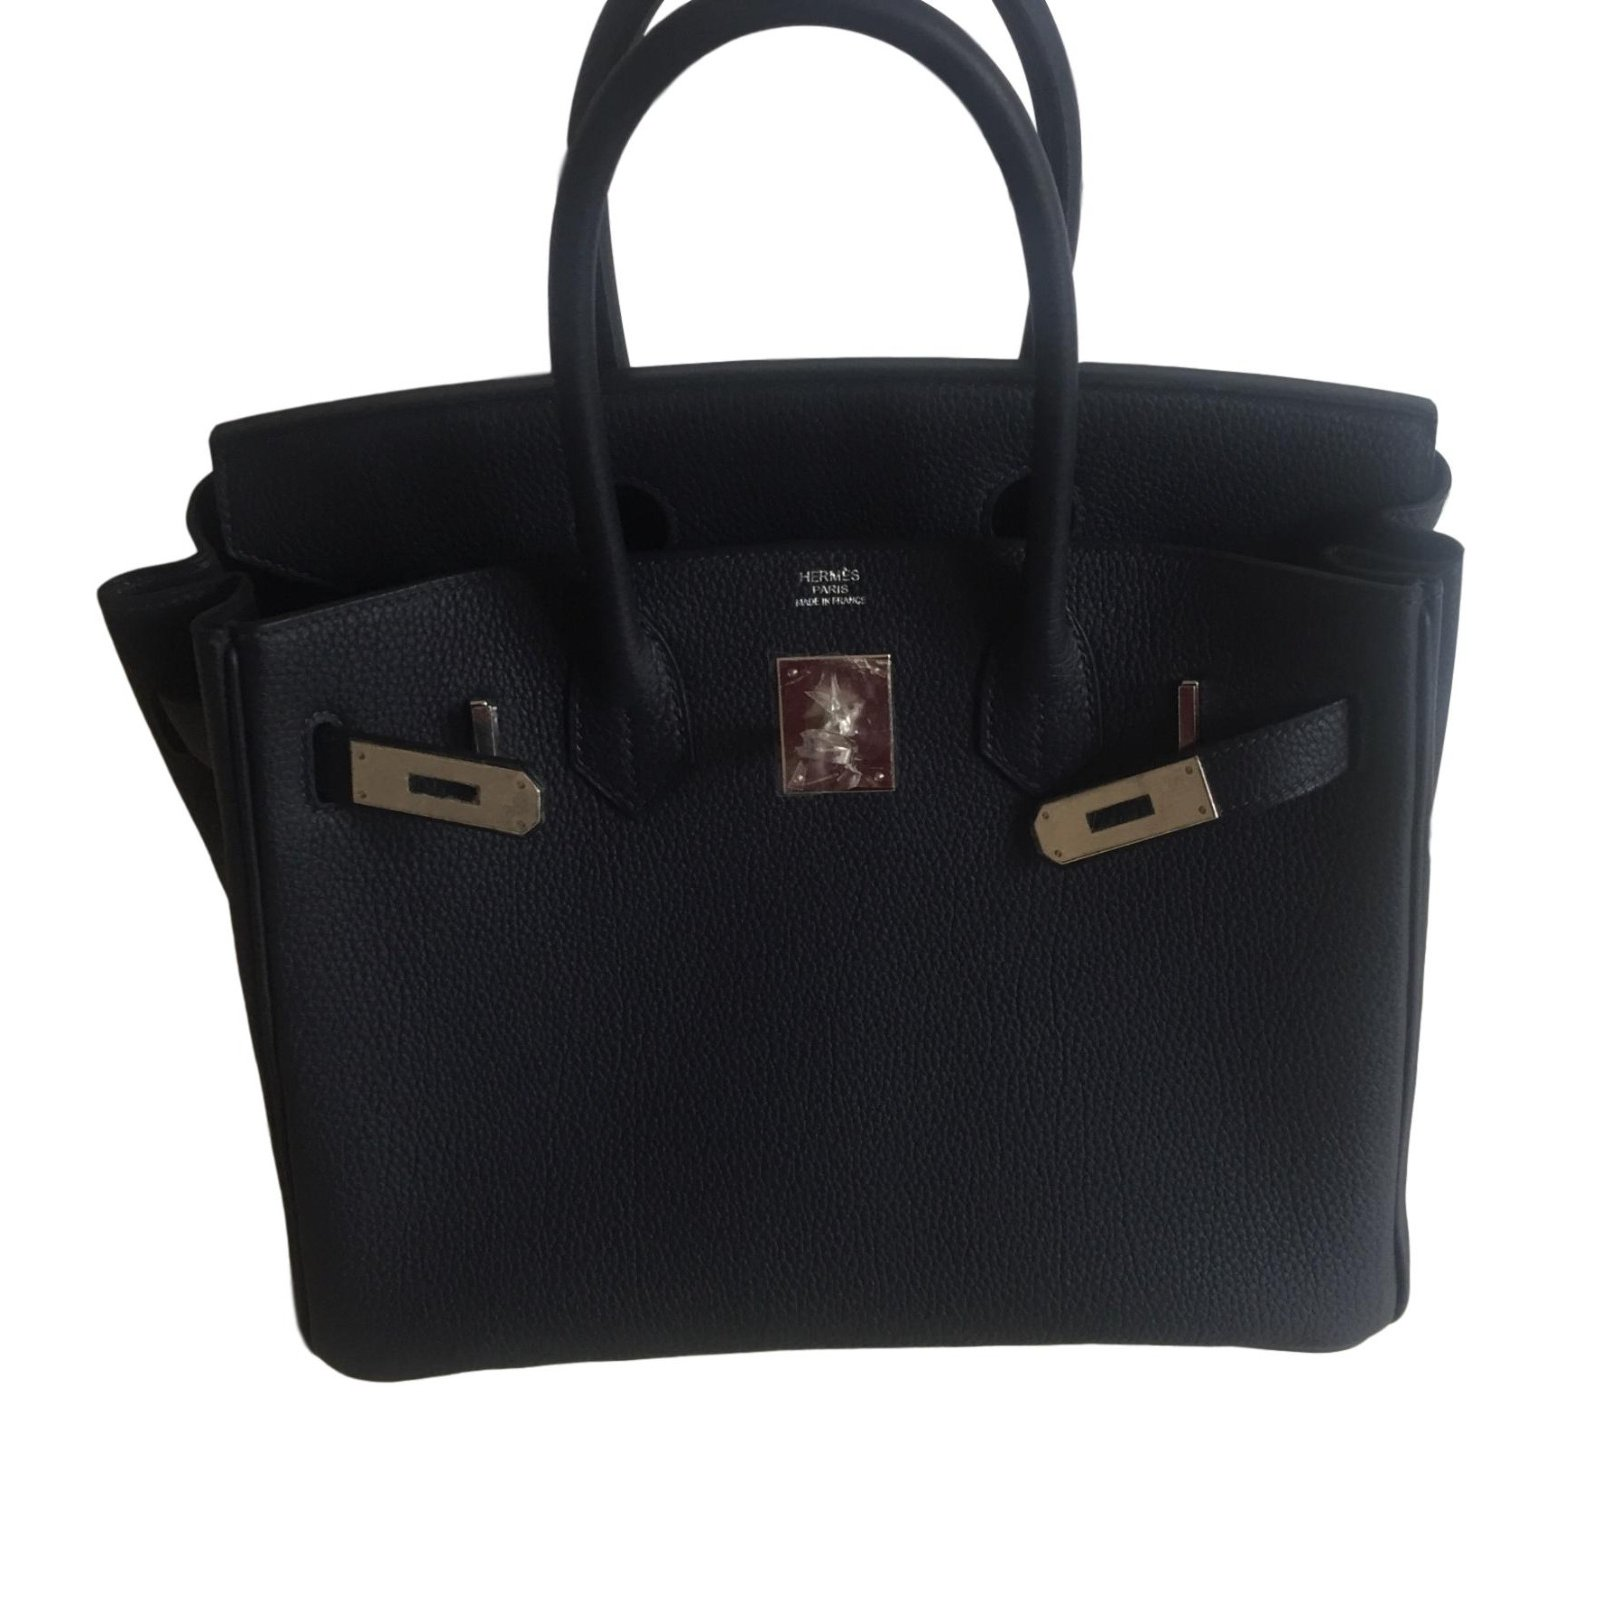 ... buy hermès birkin 30 handbags leather navy blue ref.47483 421e9 91fab 8f62888be32d4